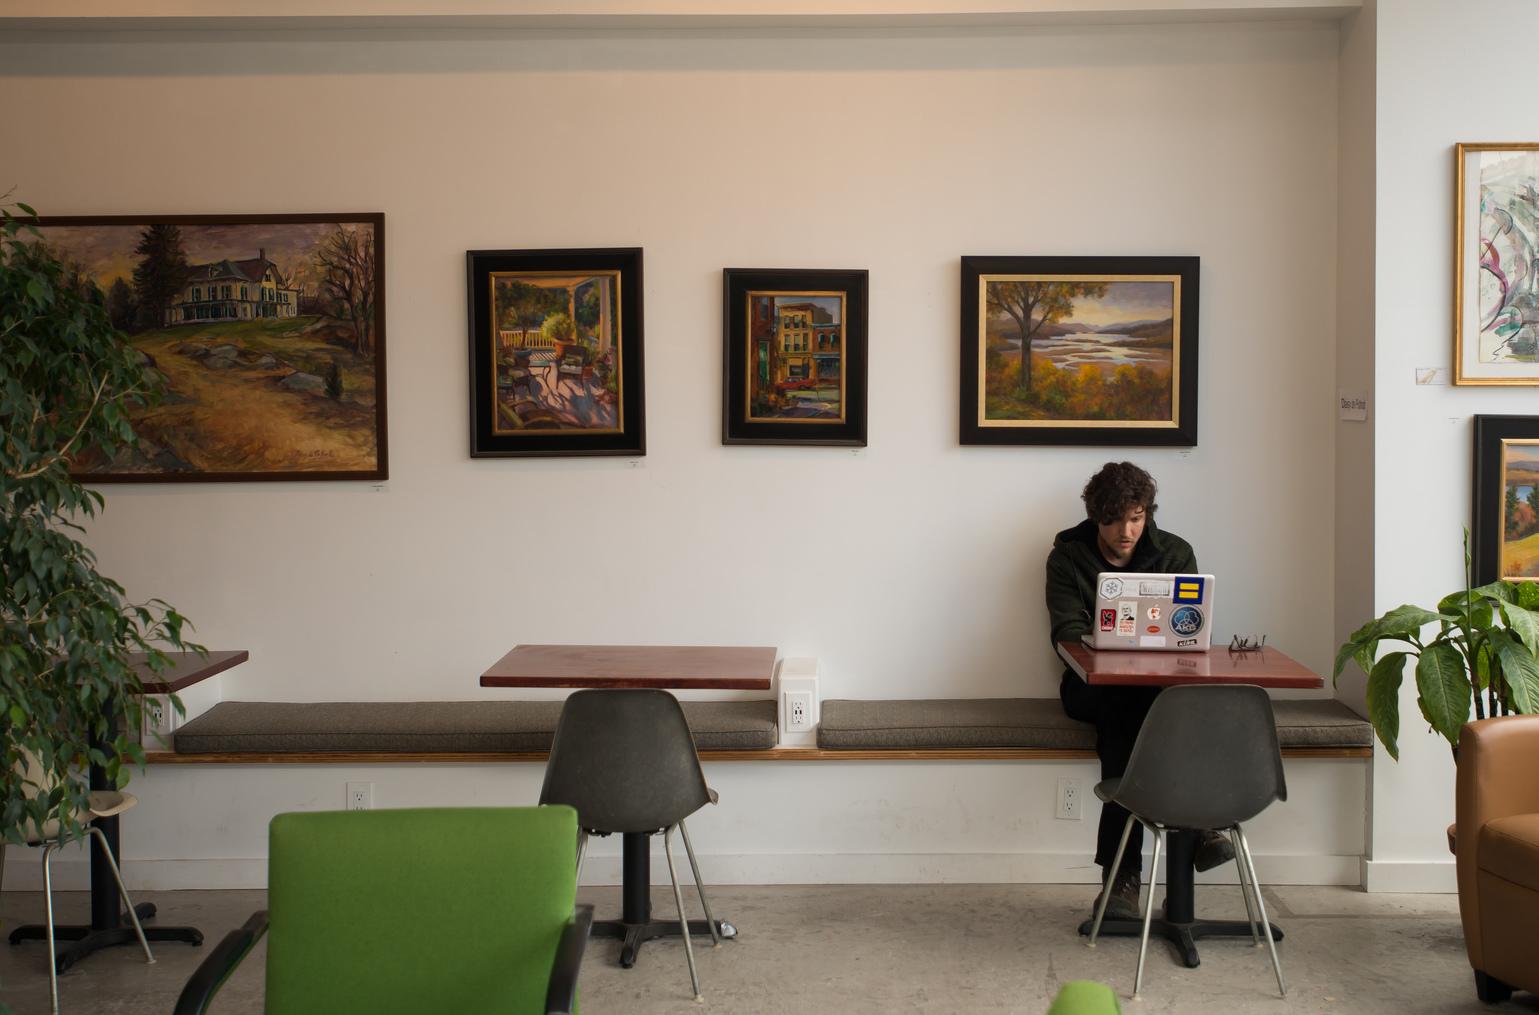 Grit associate membership, coworking in the hudson valley